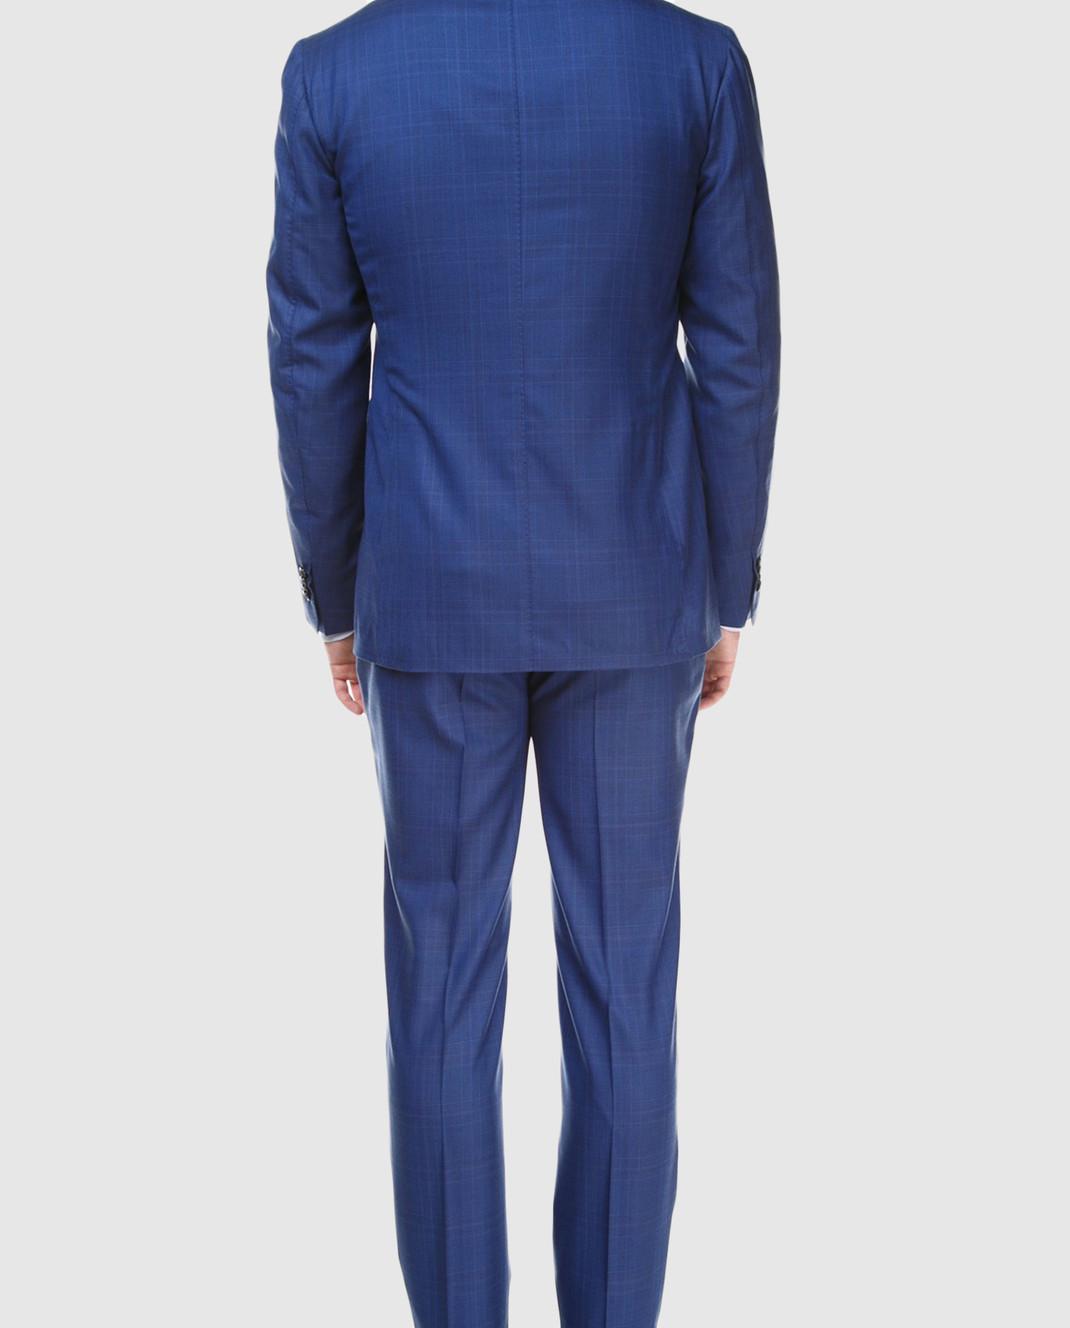 Stile Latino Синий костюм из шерсти AULUCA20A21SWA14 изображение 5